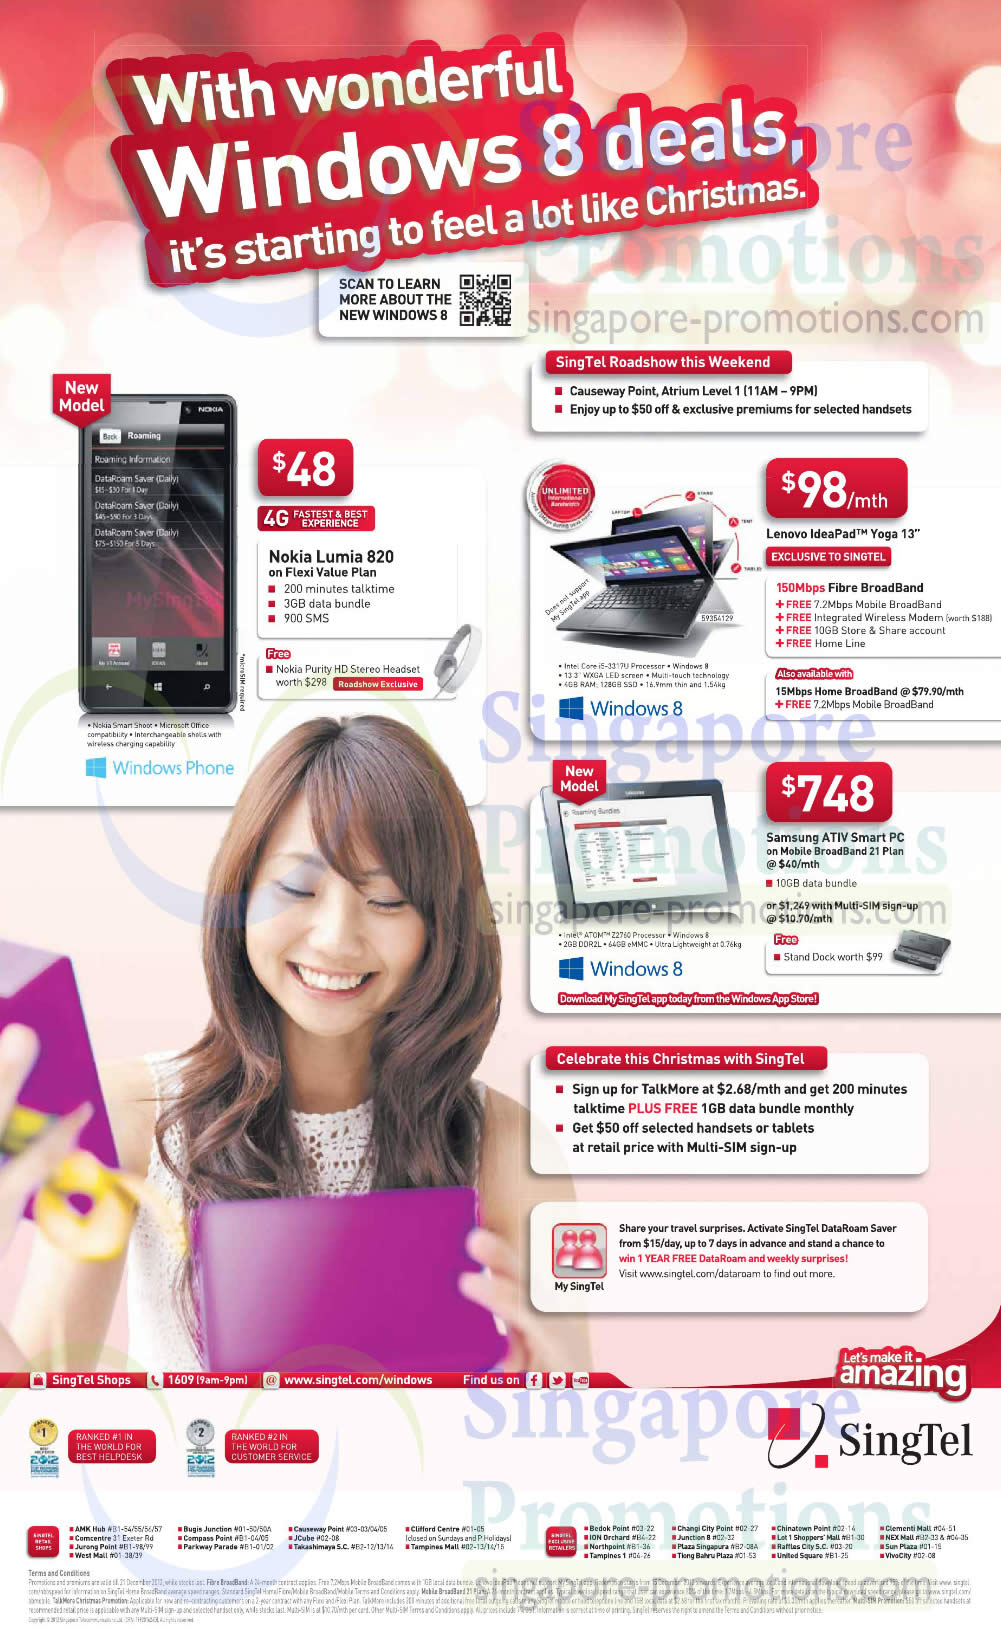 Nokia Lumia 820, Lenovo Ideapad Yoga 13, Samsung ATIV Smart PC on Mobile Broadband 21 Plan